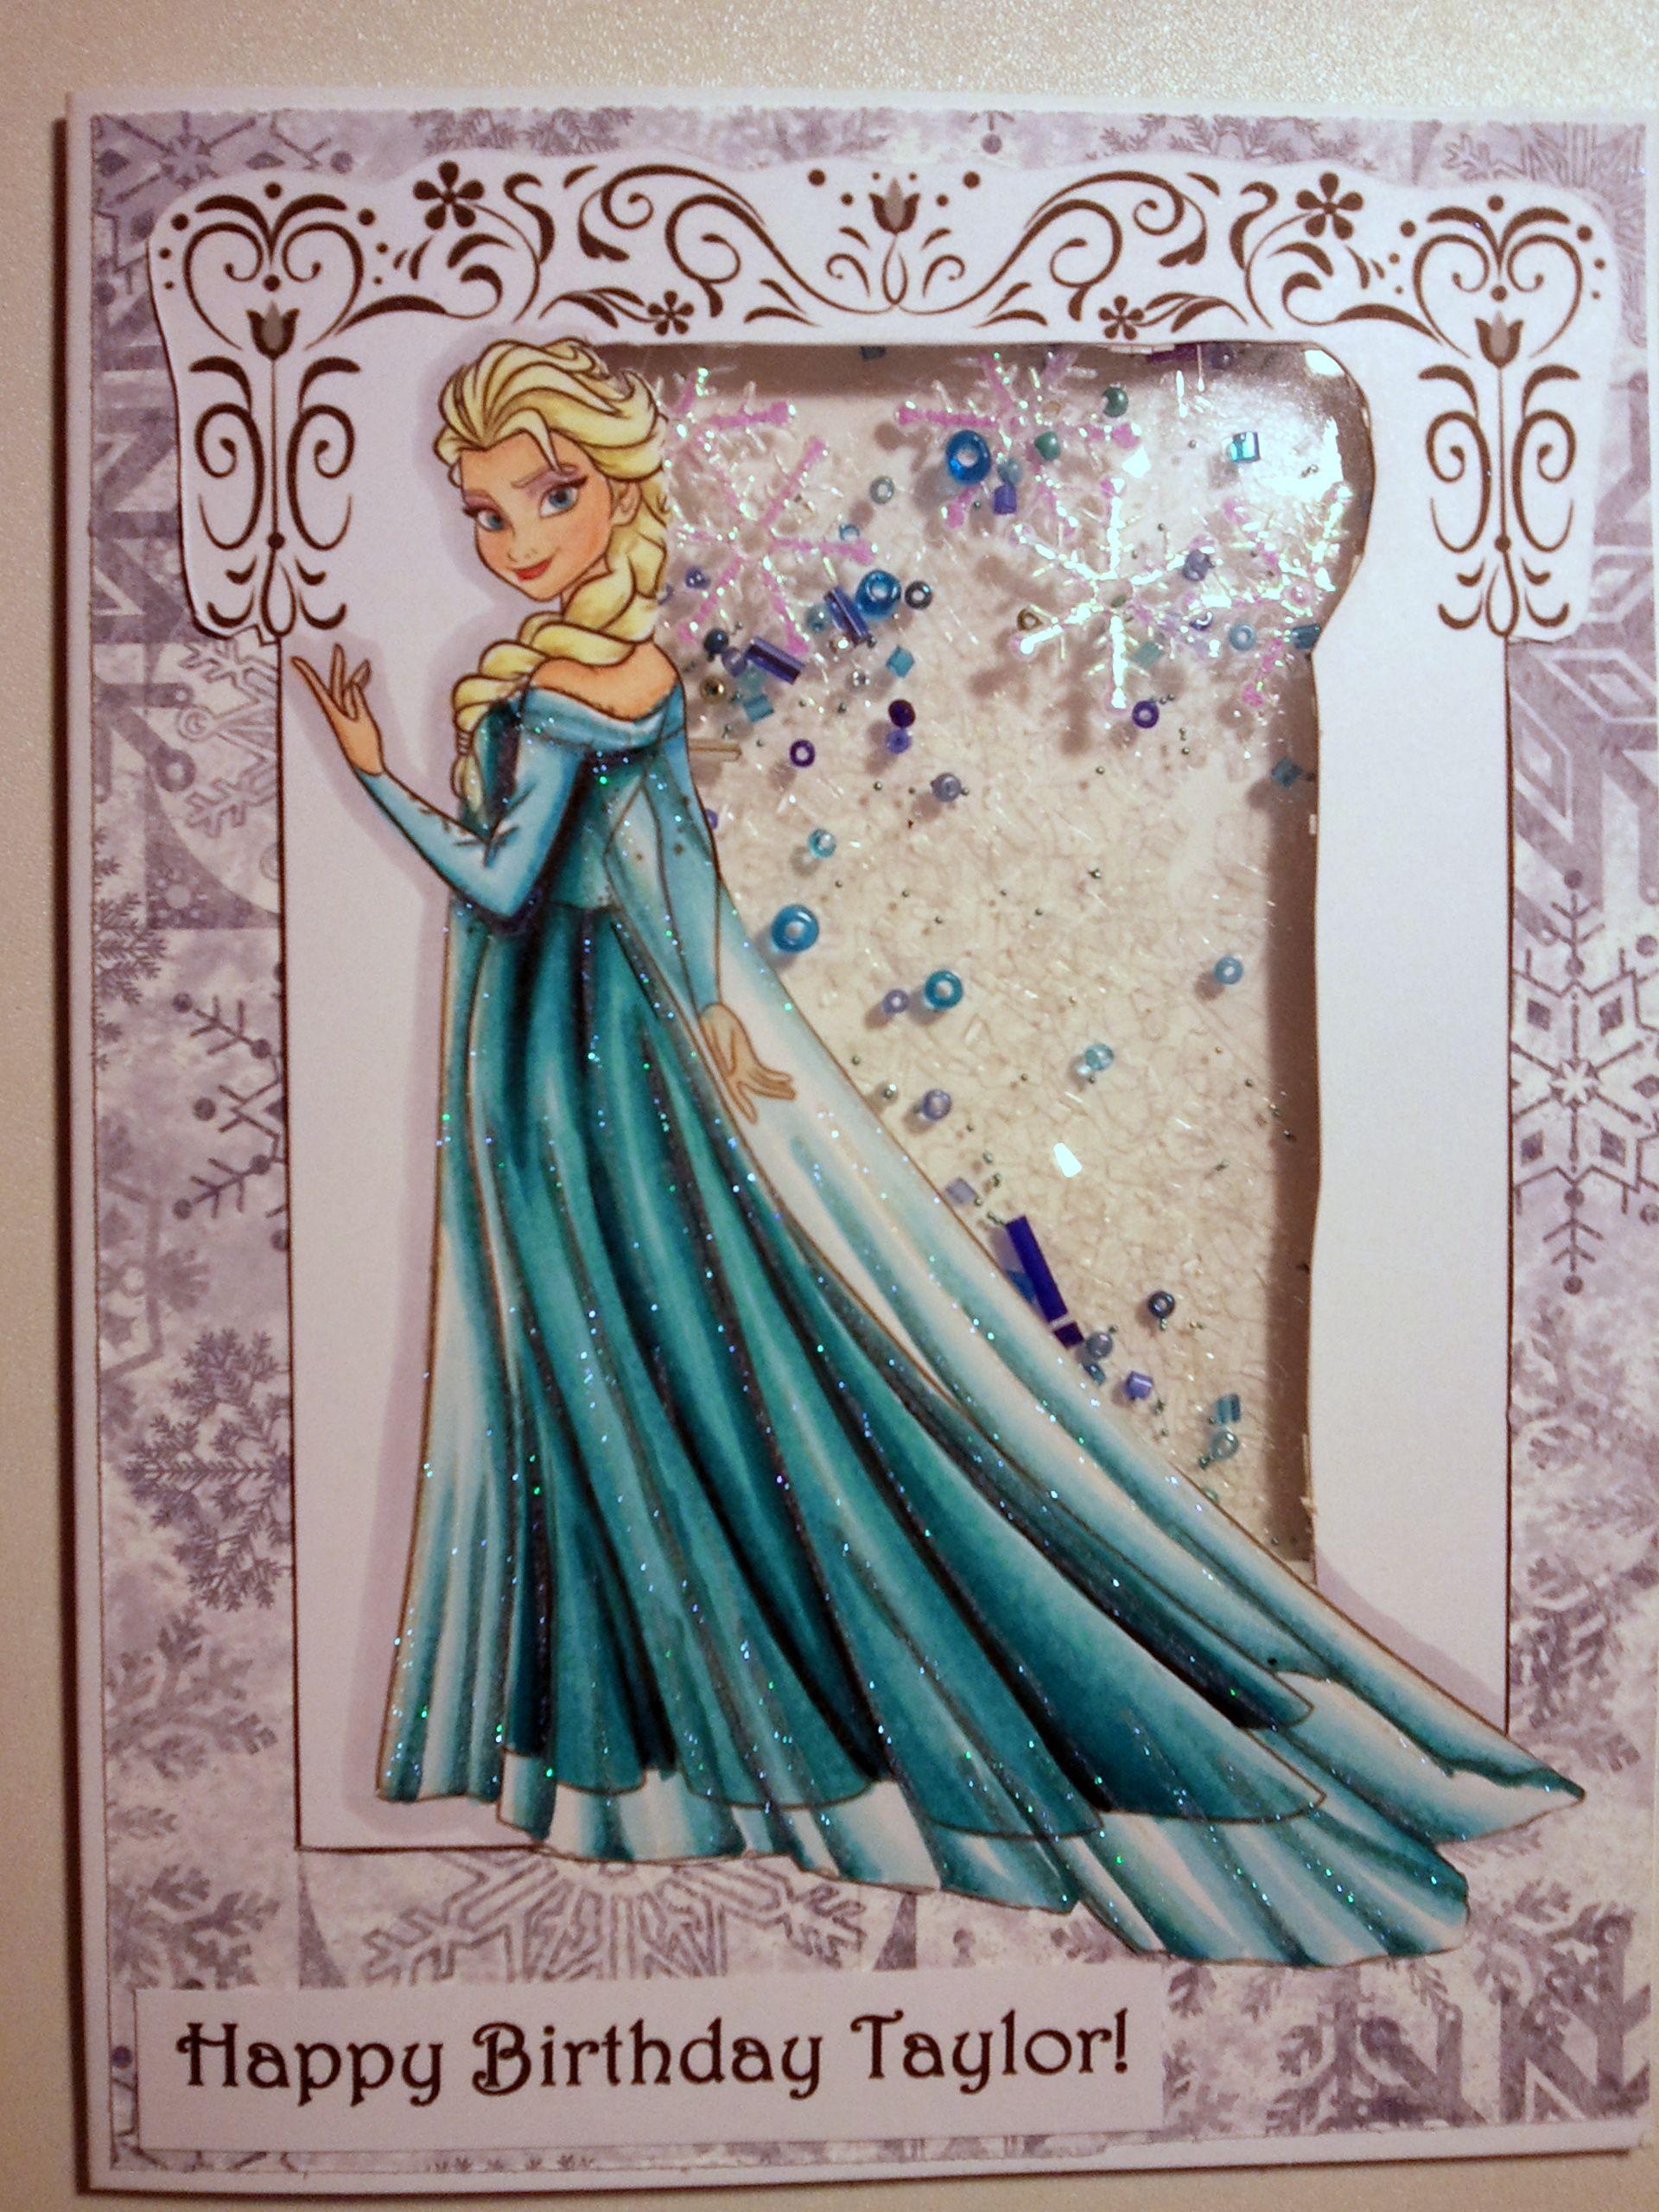 Elsa From Frozen A Handmade Frozen Themed Shaker Card For My Niece S 5th Birthday Girl Birthday Cards Frozen Cards Themed Cards